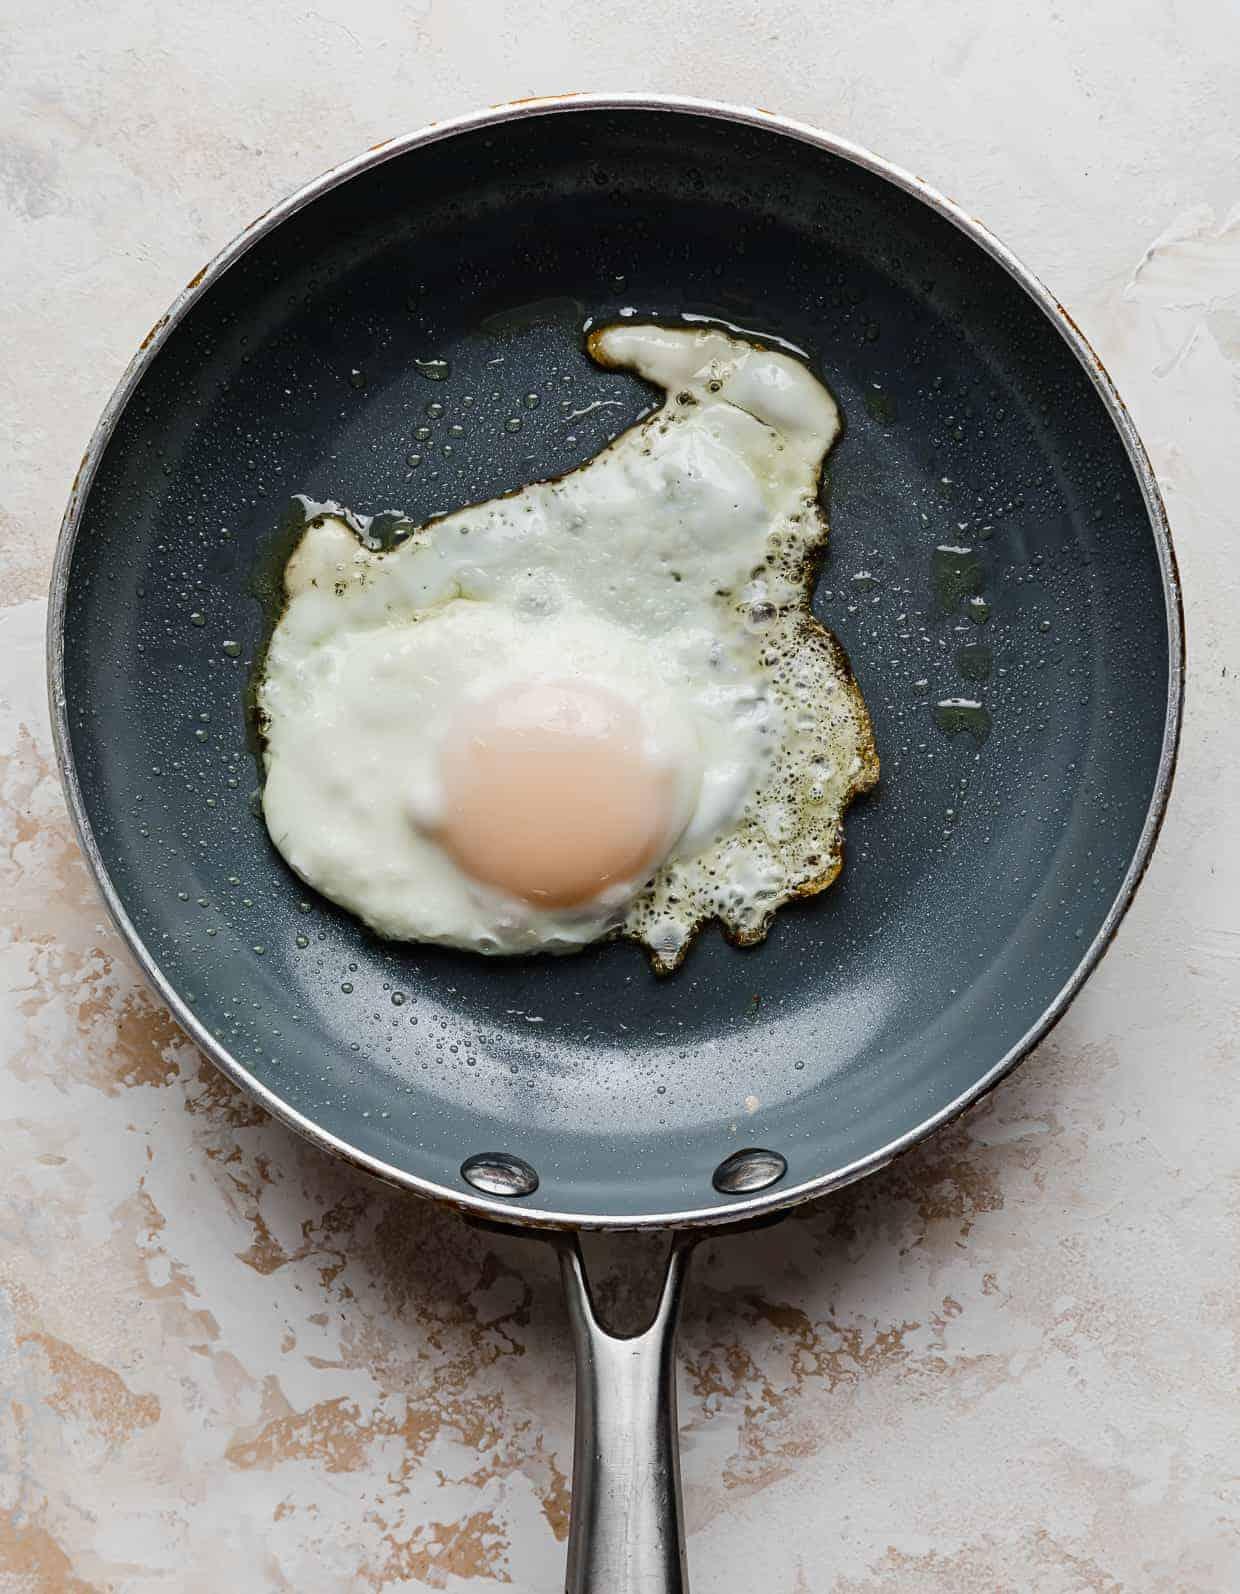 A sunny side up egg on a gray skillet.